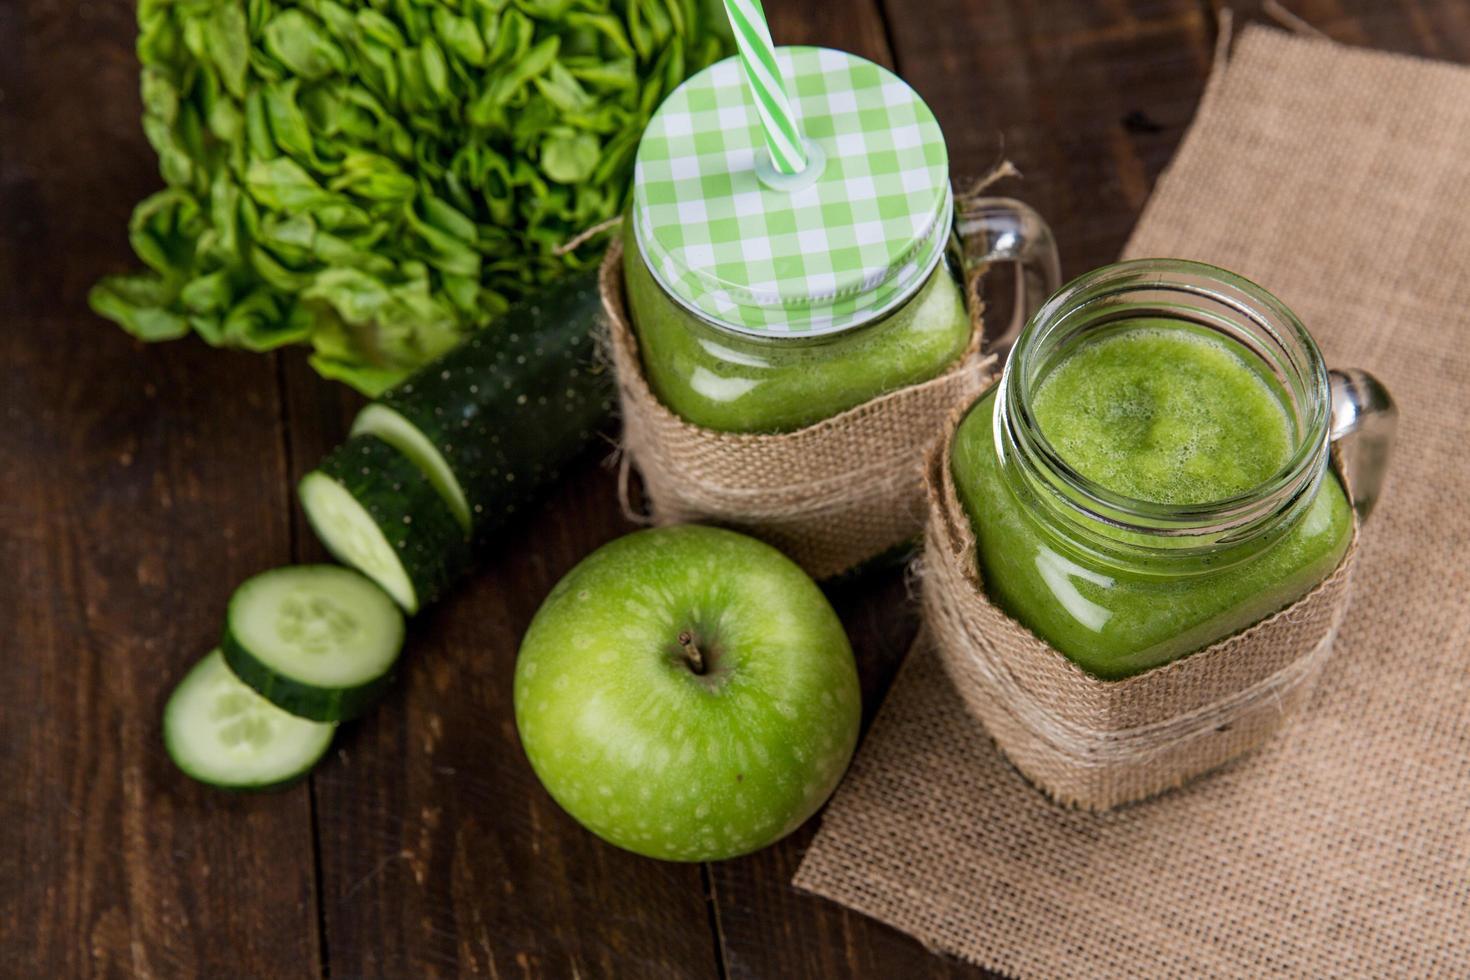 groene smoothies, zijhoek foto